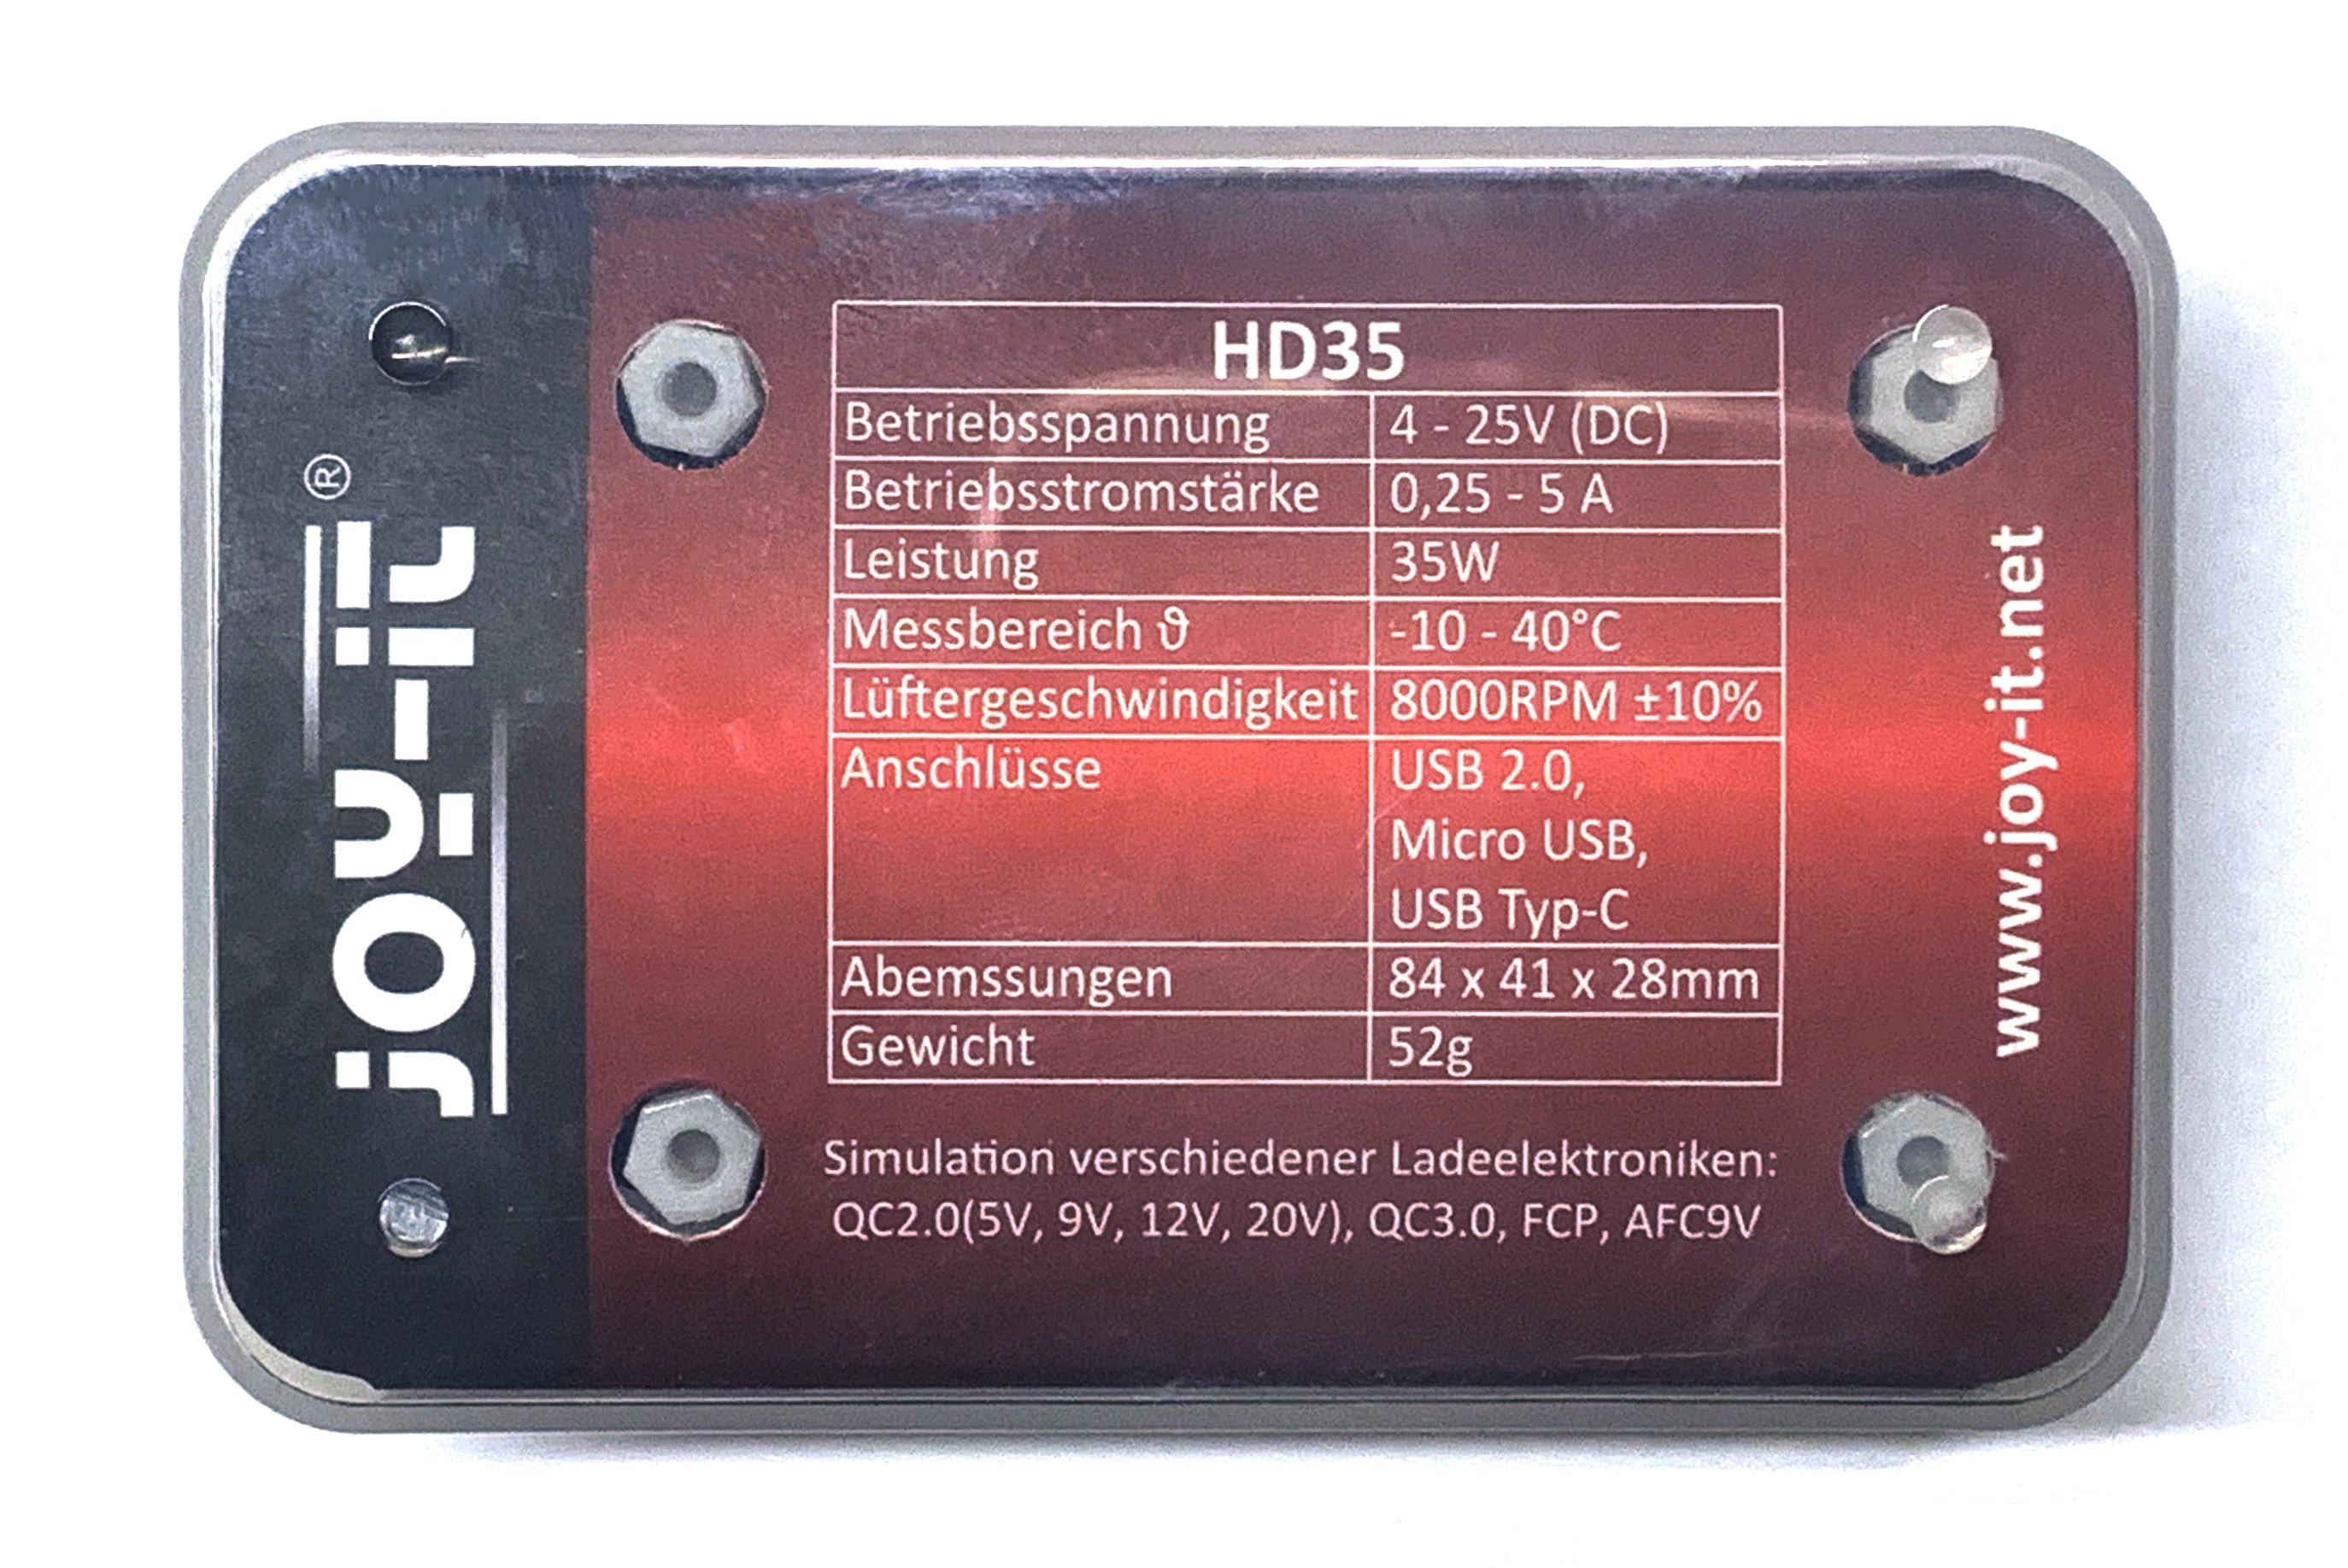 Elektor - Elektor - Banc d'essai : charge électronique USB Joy-IT HD35